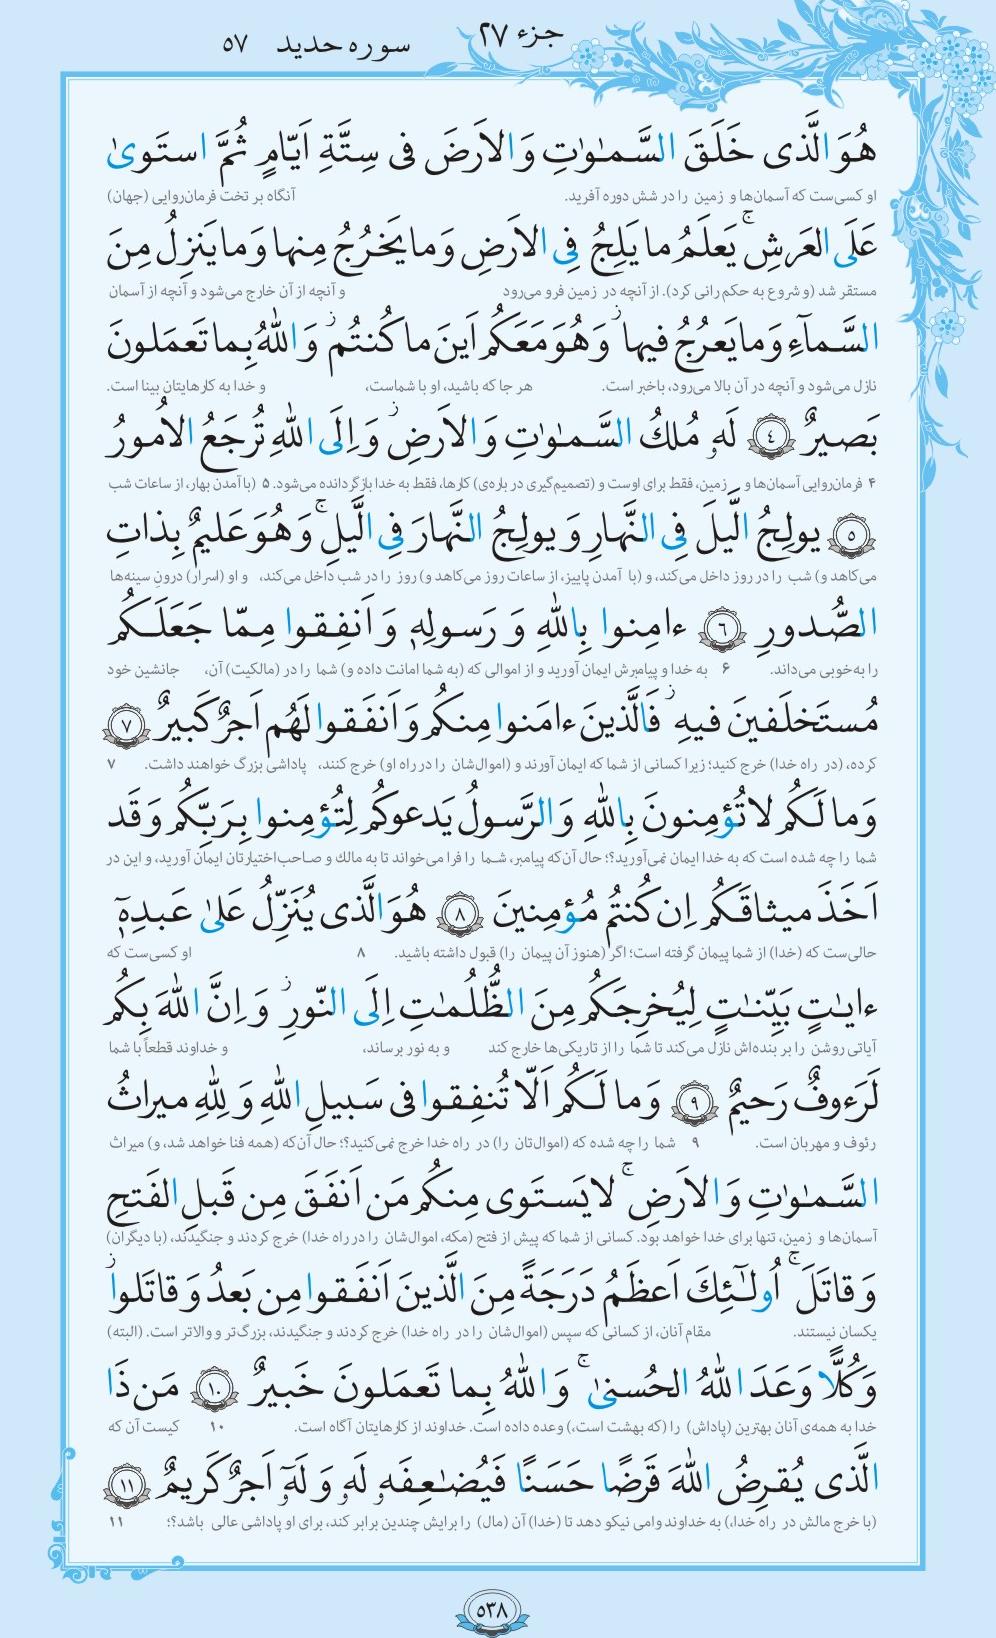 13990817000774 Test NewPhotoFree - ترتیل صفحه ۵۳۸ قرآن+فیلم و متن آیات